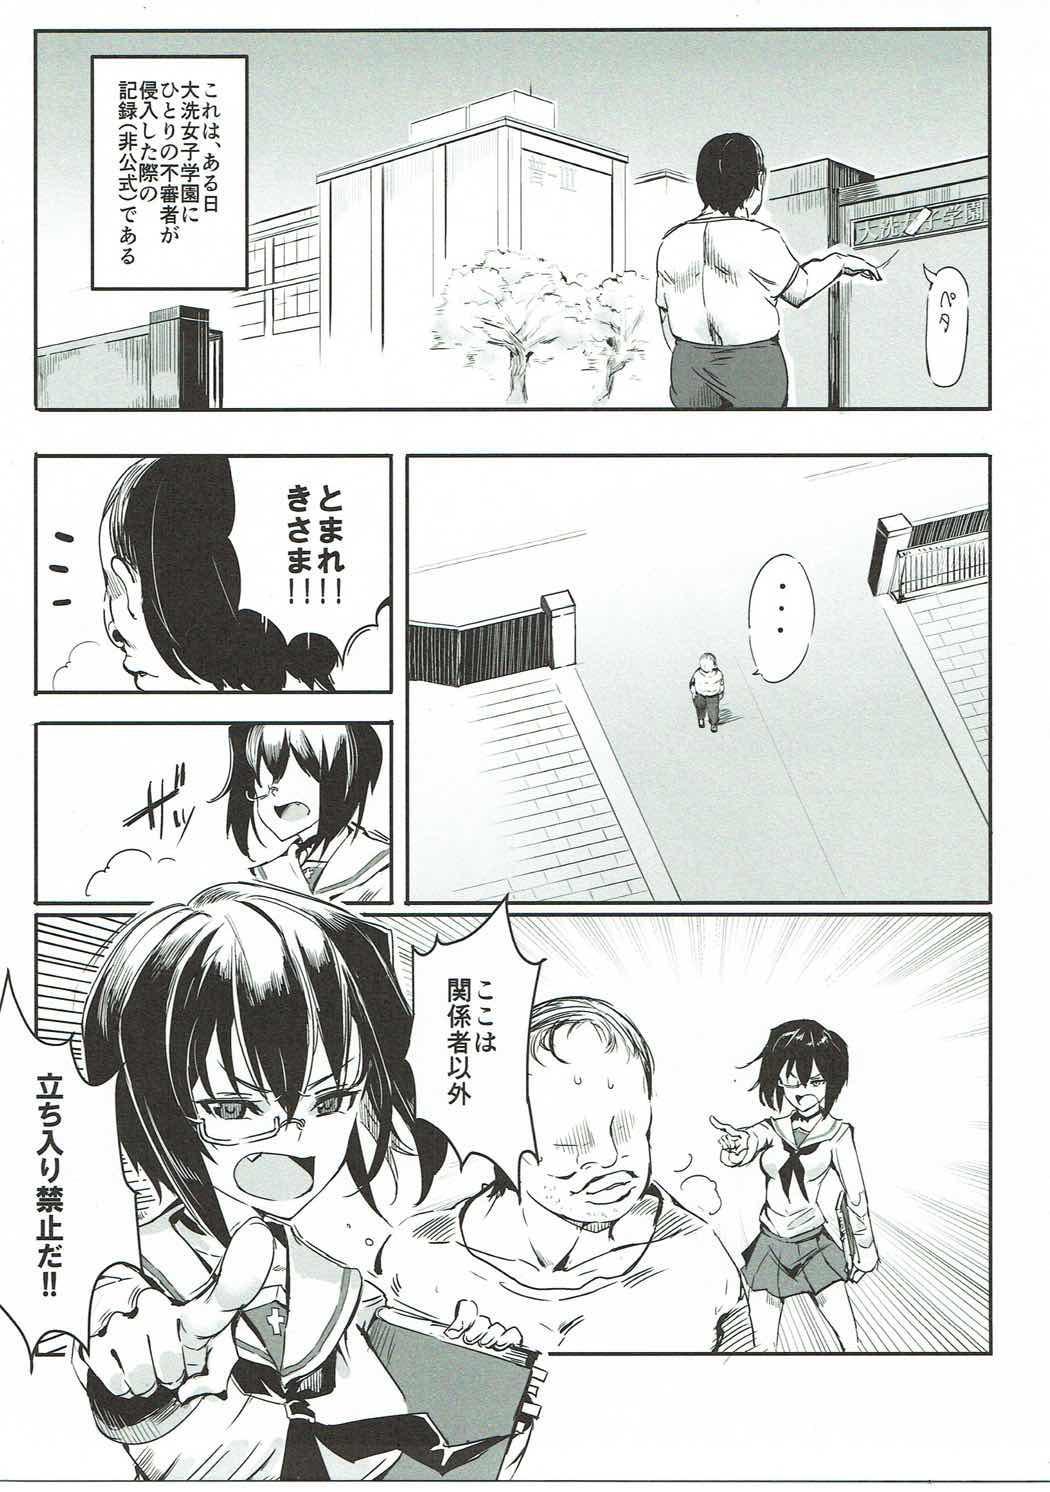 Girls & Kyousei Panpan 3